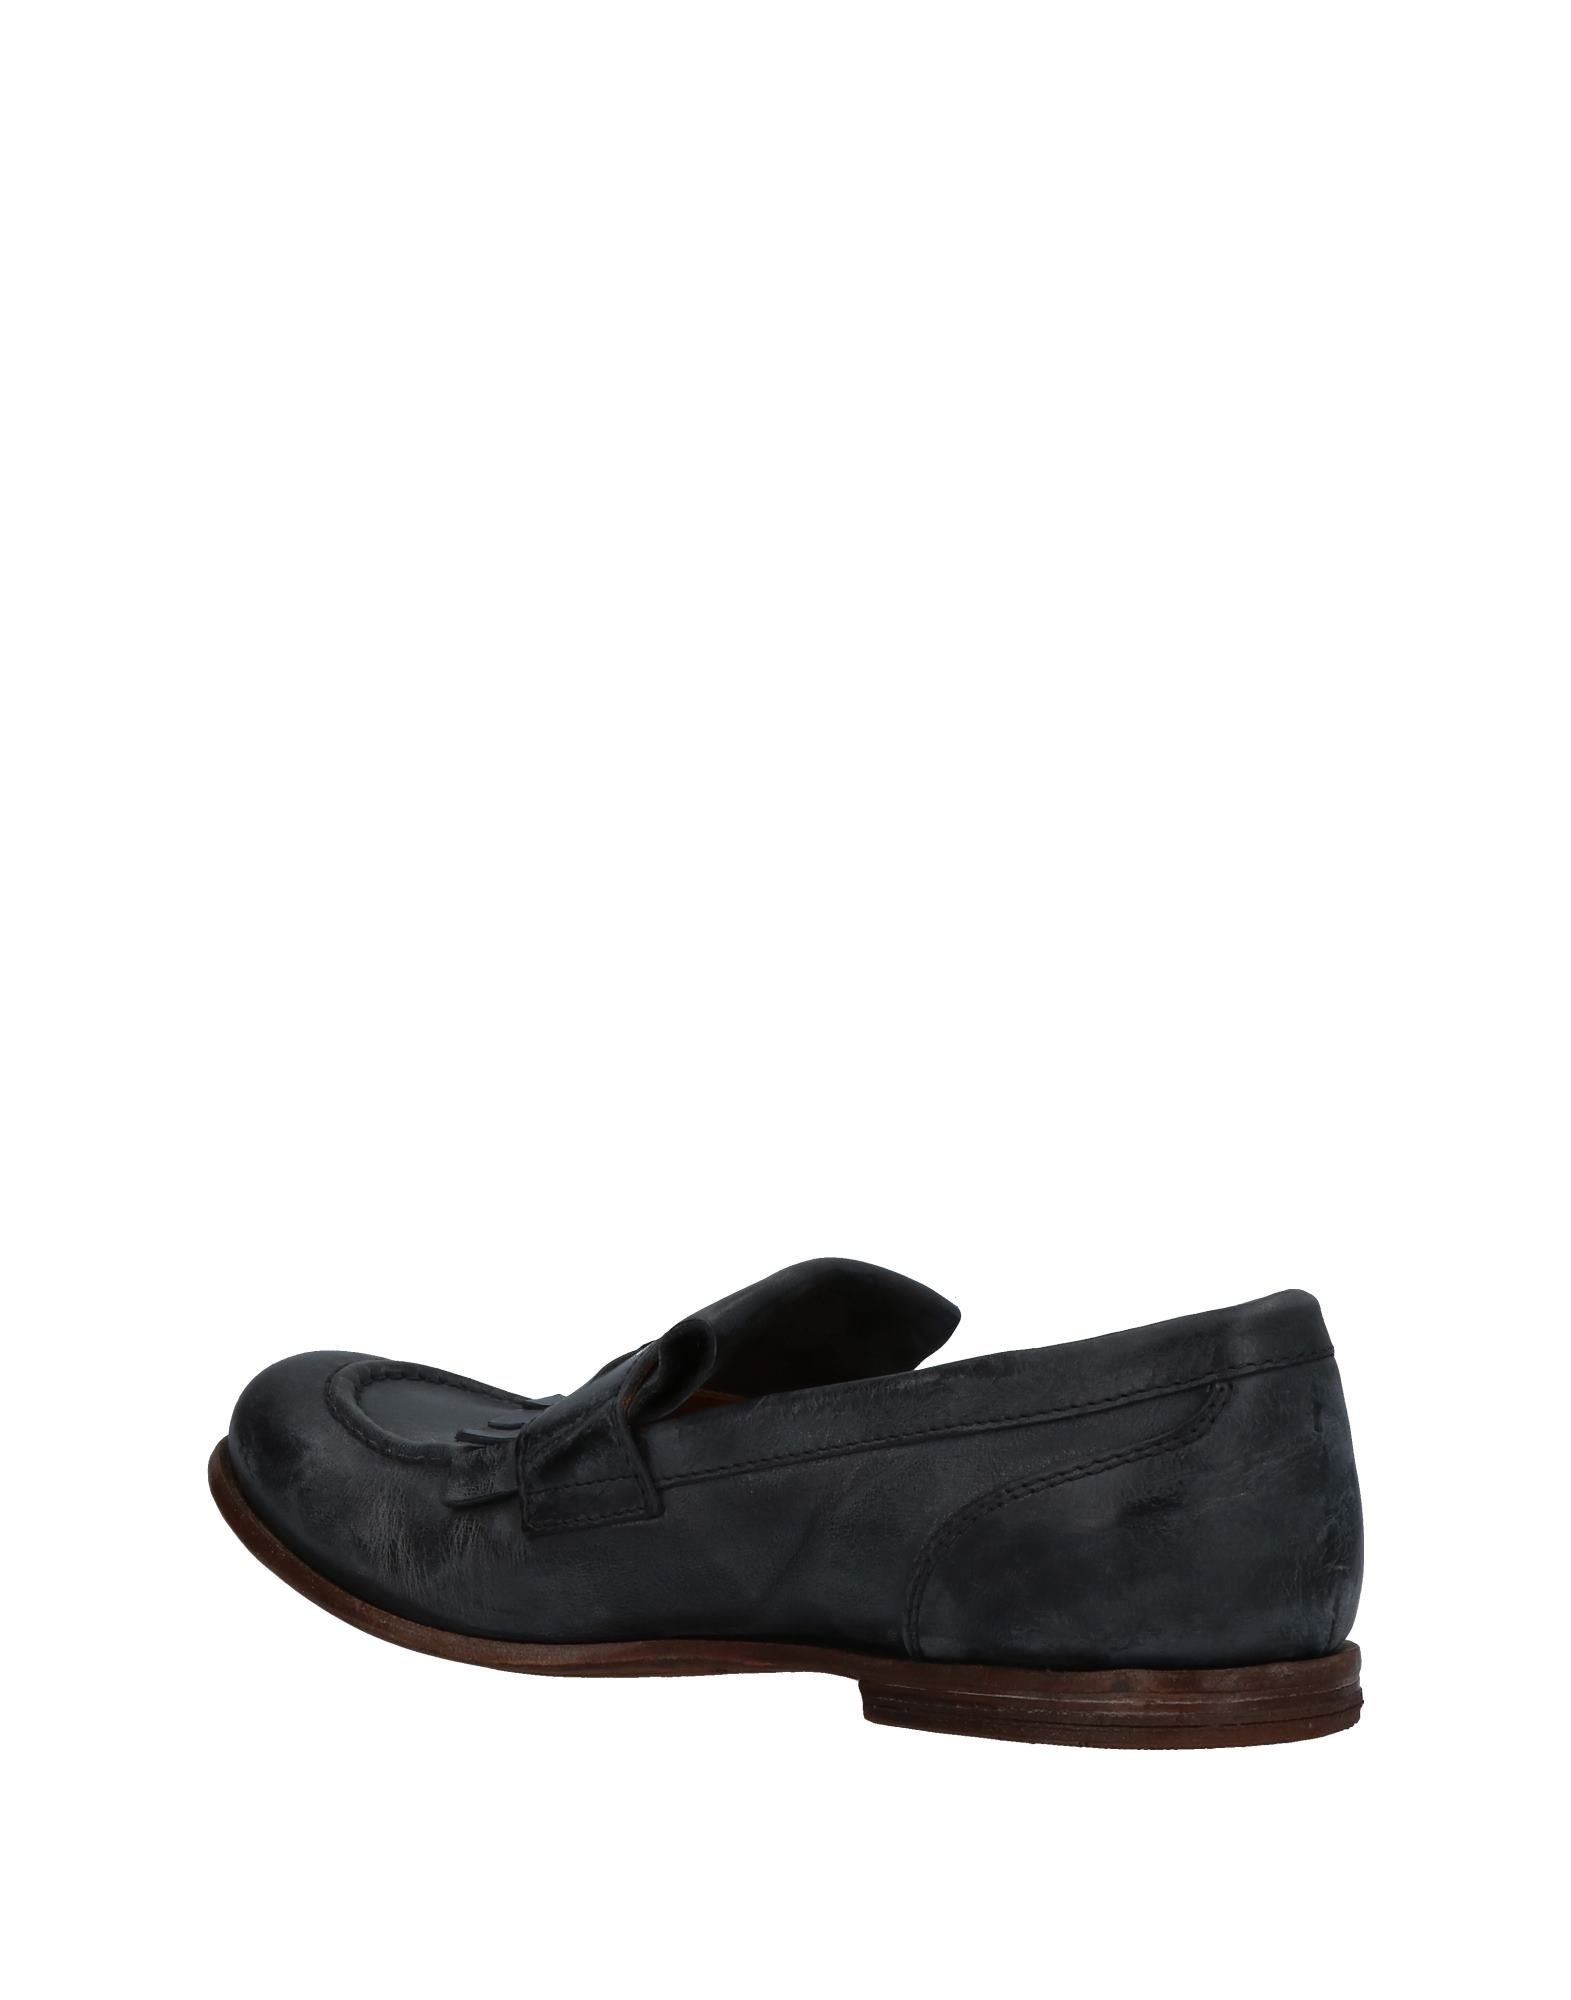 Moma Mokassins Damen  11411840VTGut Schuhe aussehende strapazierfähige Schuhe 11411840VTGut 812f6f